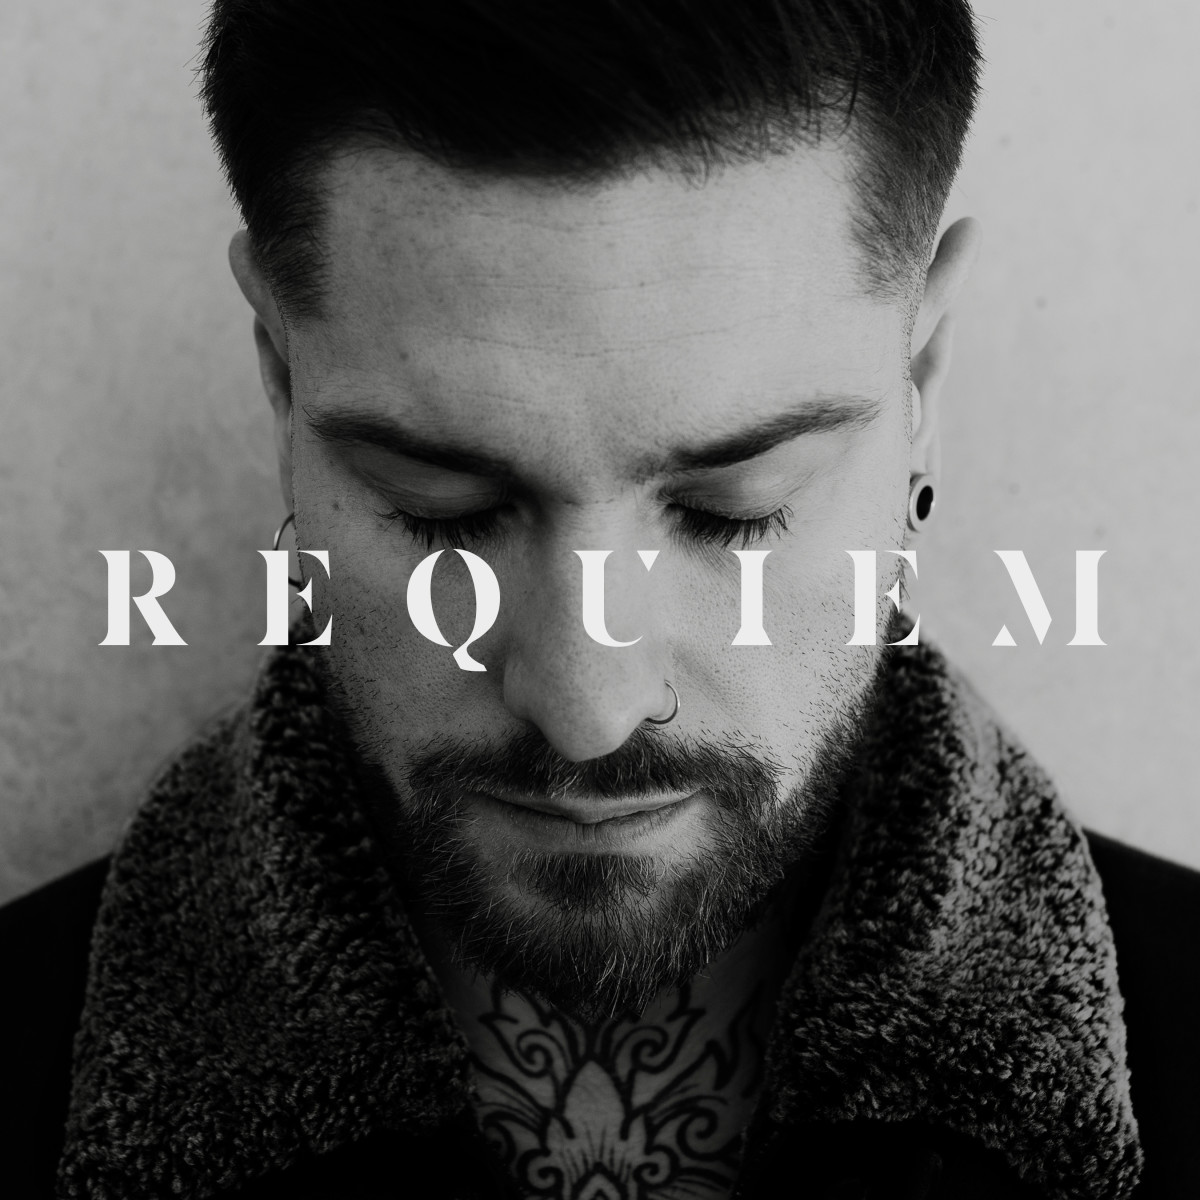 Rafael Cerato - Requiem [Systematic Recordings]